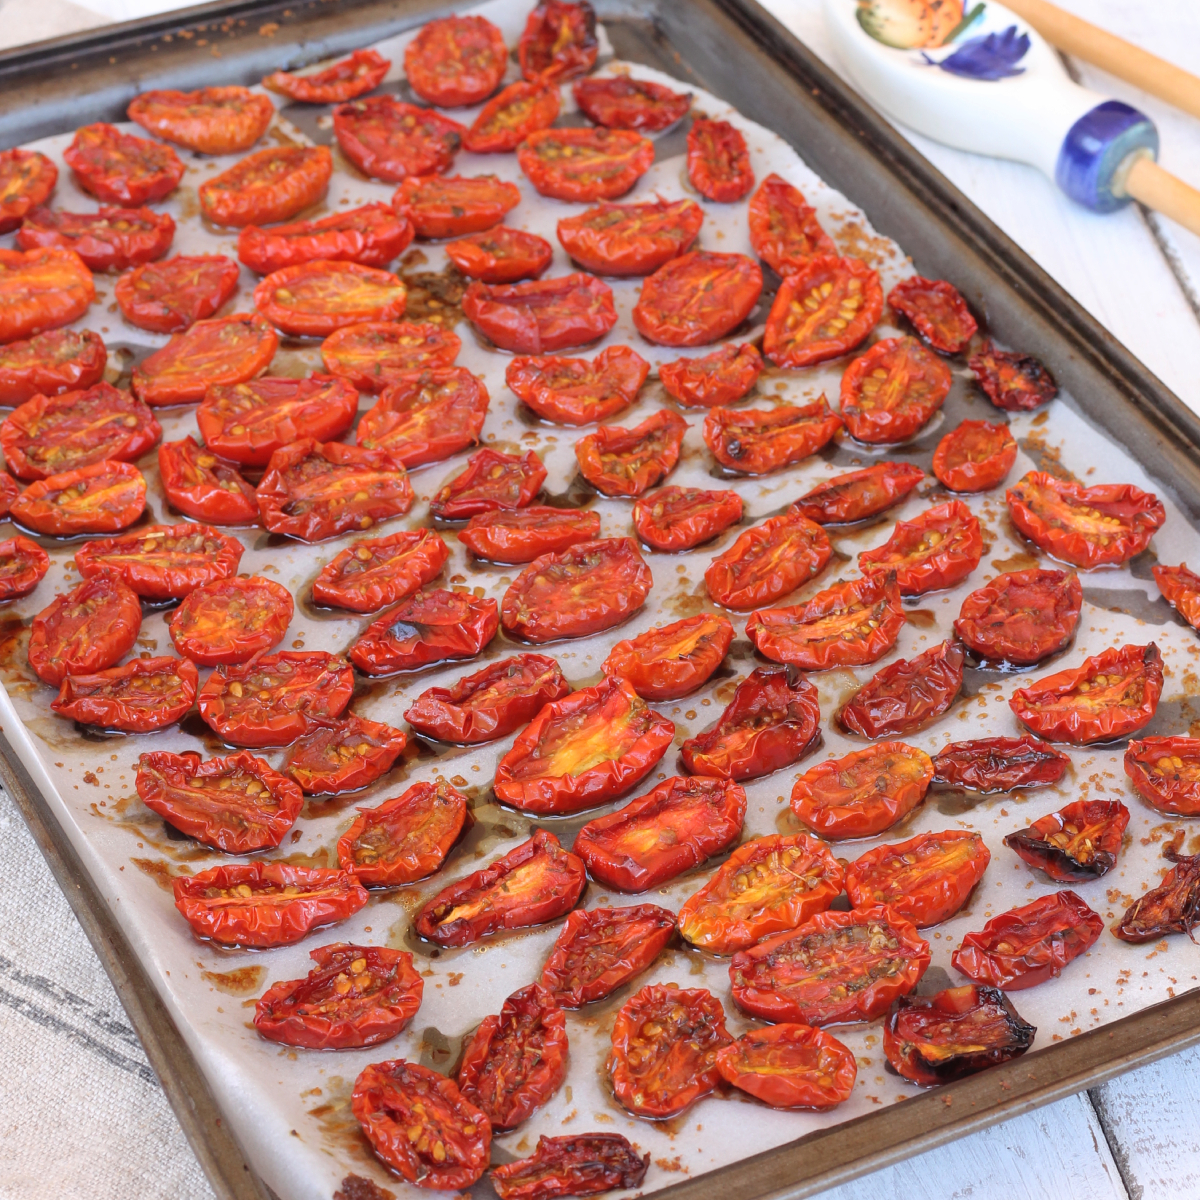 POMODORI CONFIT IN PADELLA pomodori confit ricetta | pomodorini caramellati